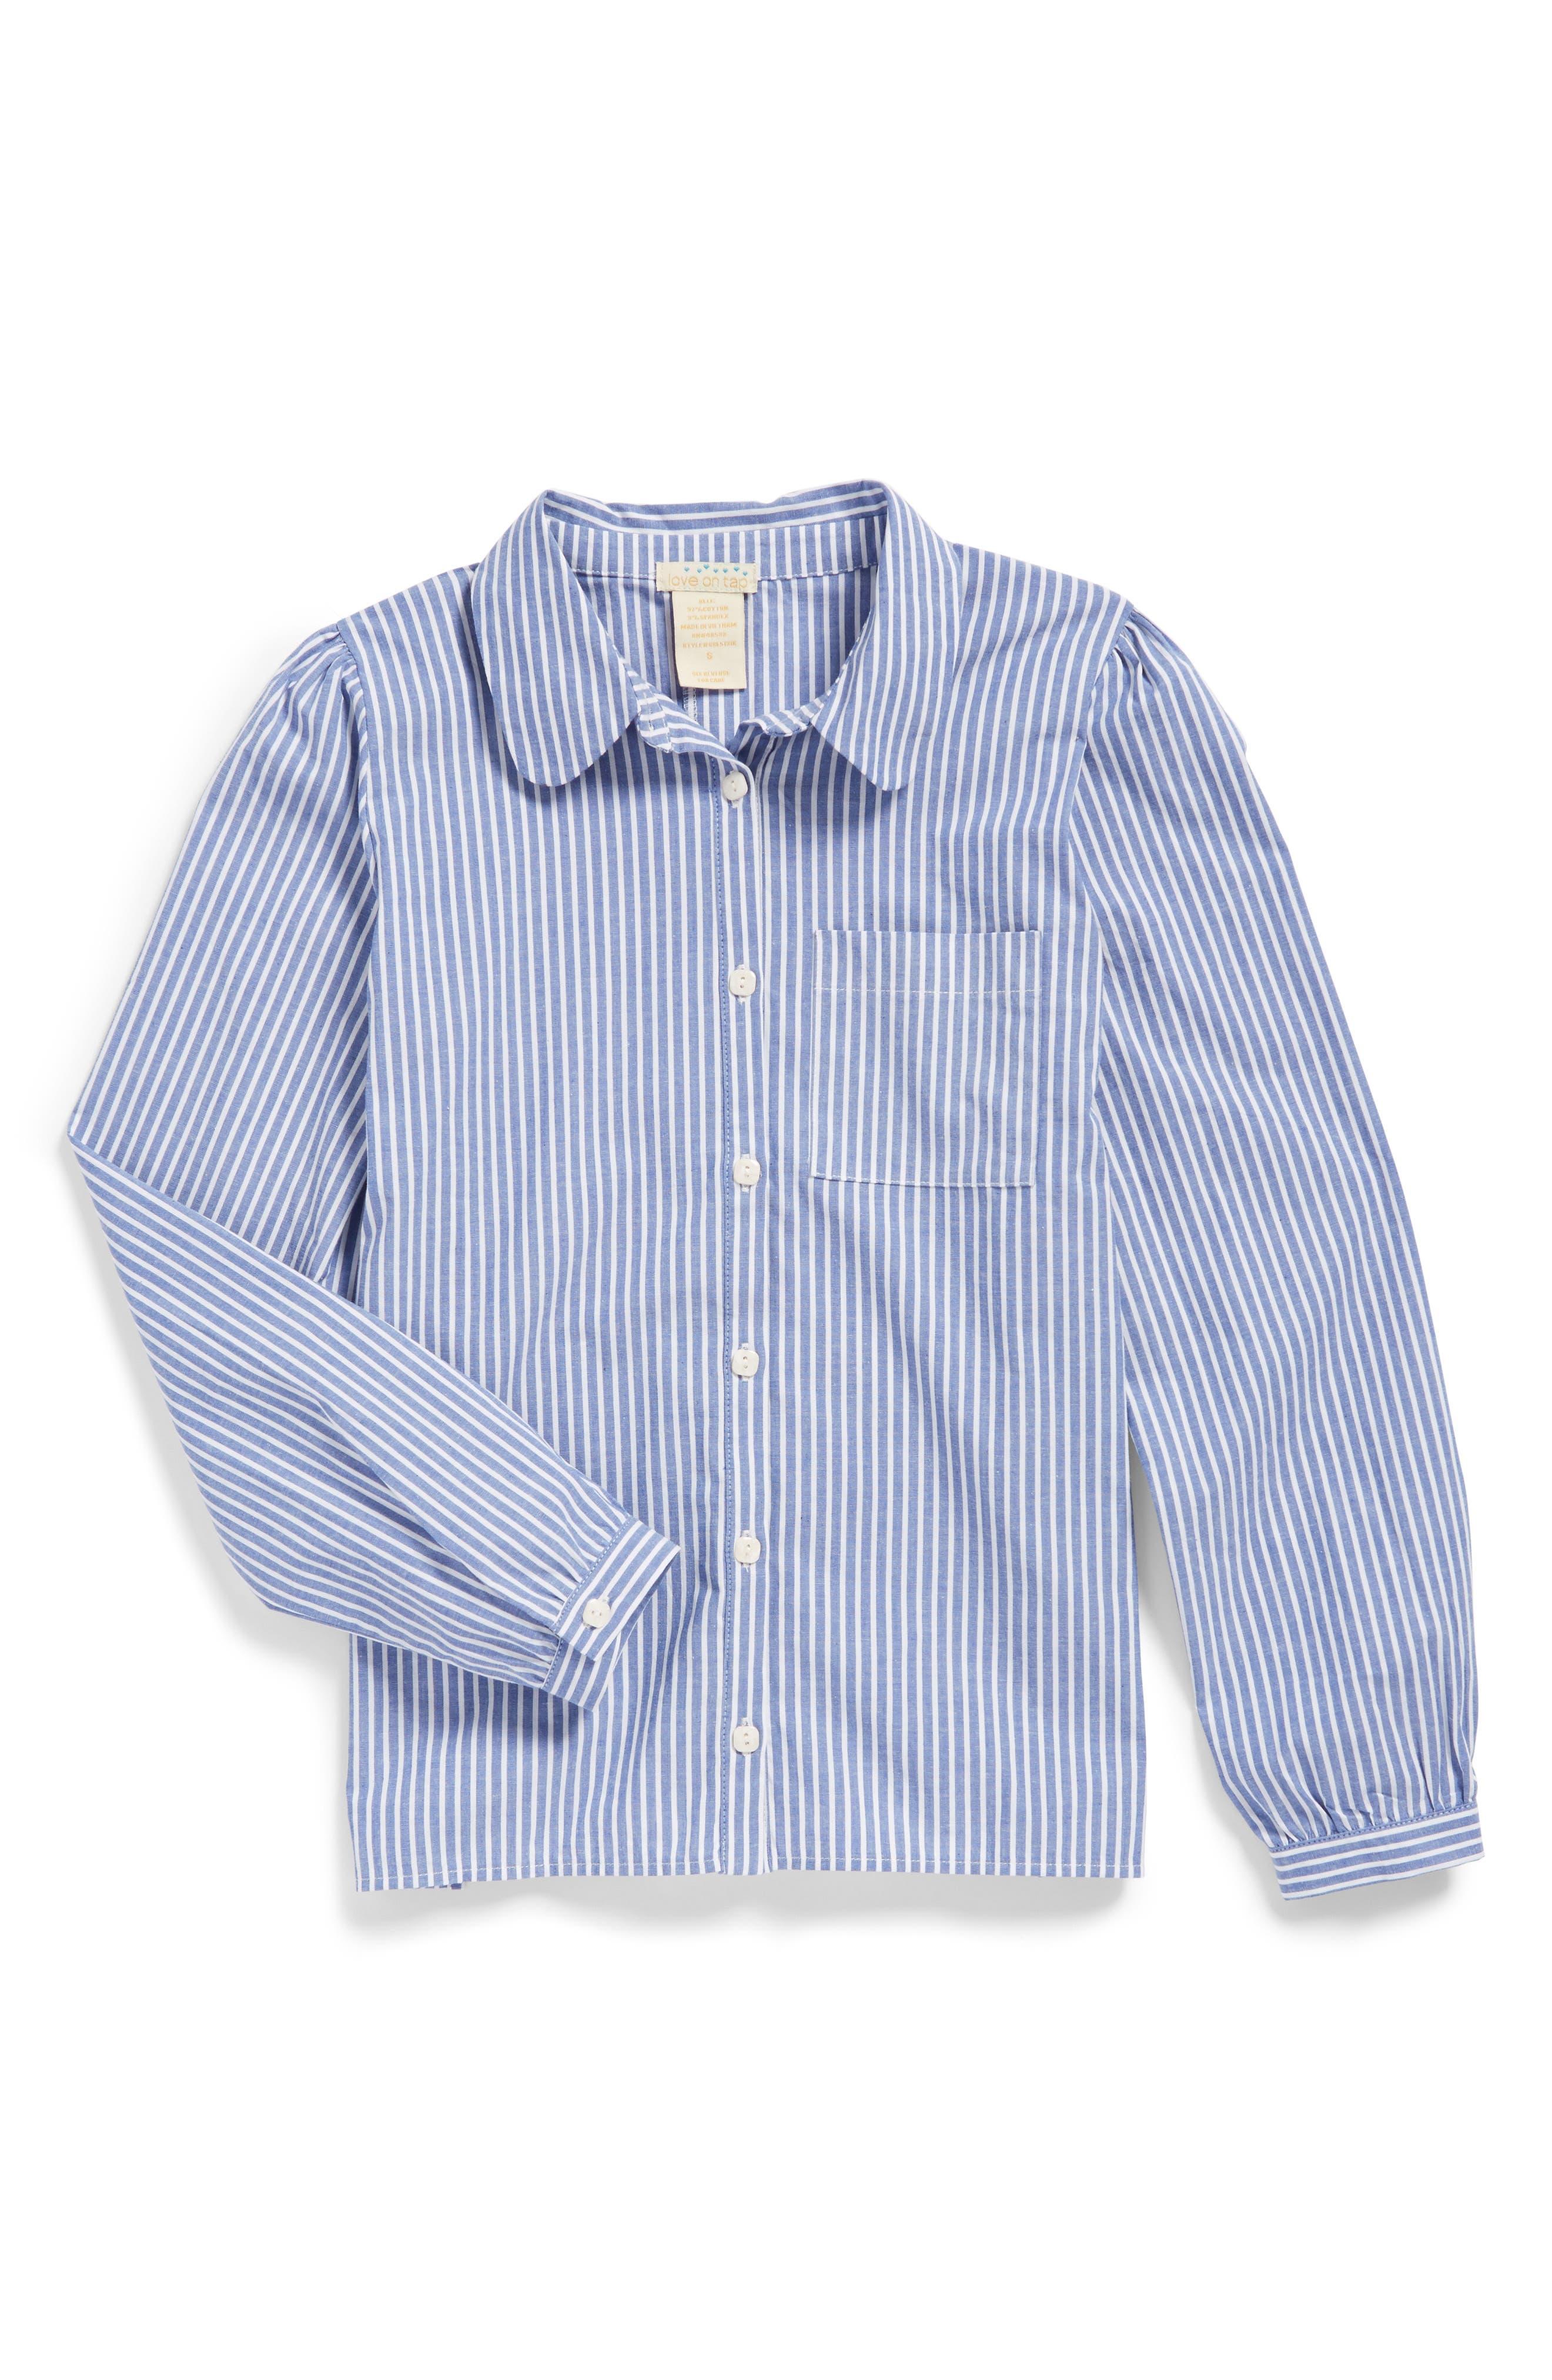 Stripe Stretch Cotton Shirt,                         Main,                         color, Royal/ White